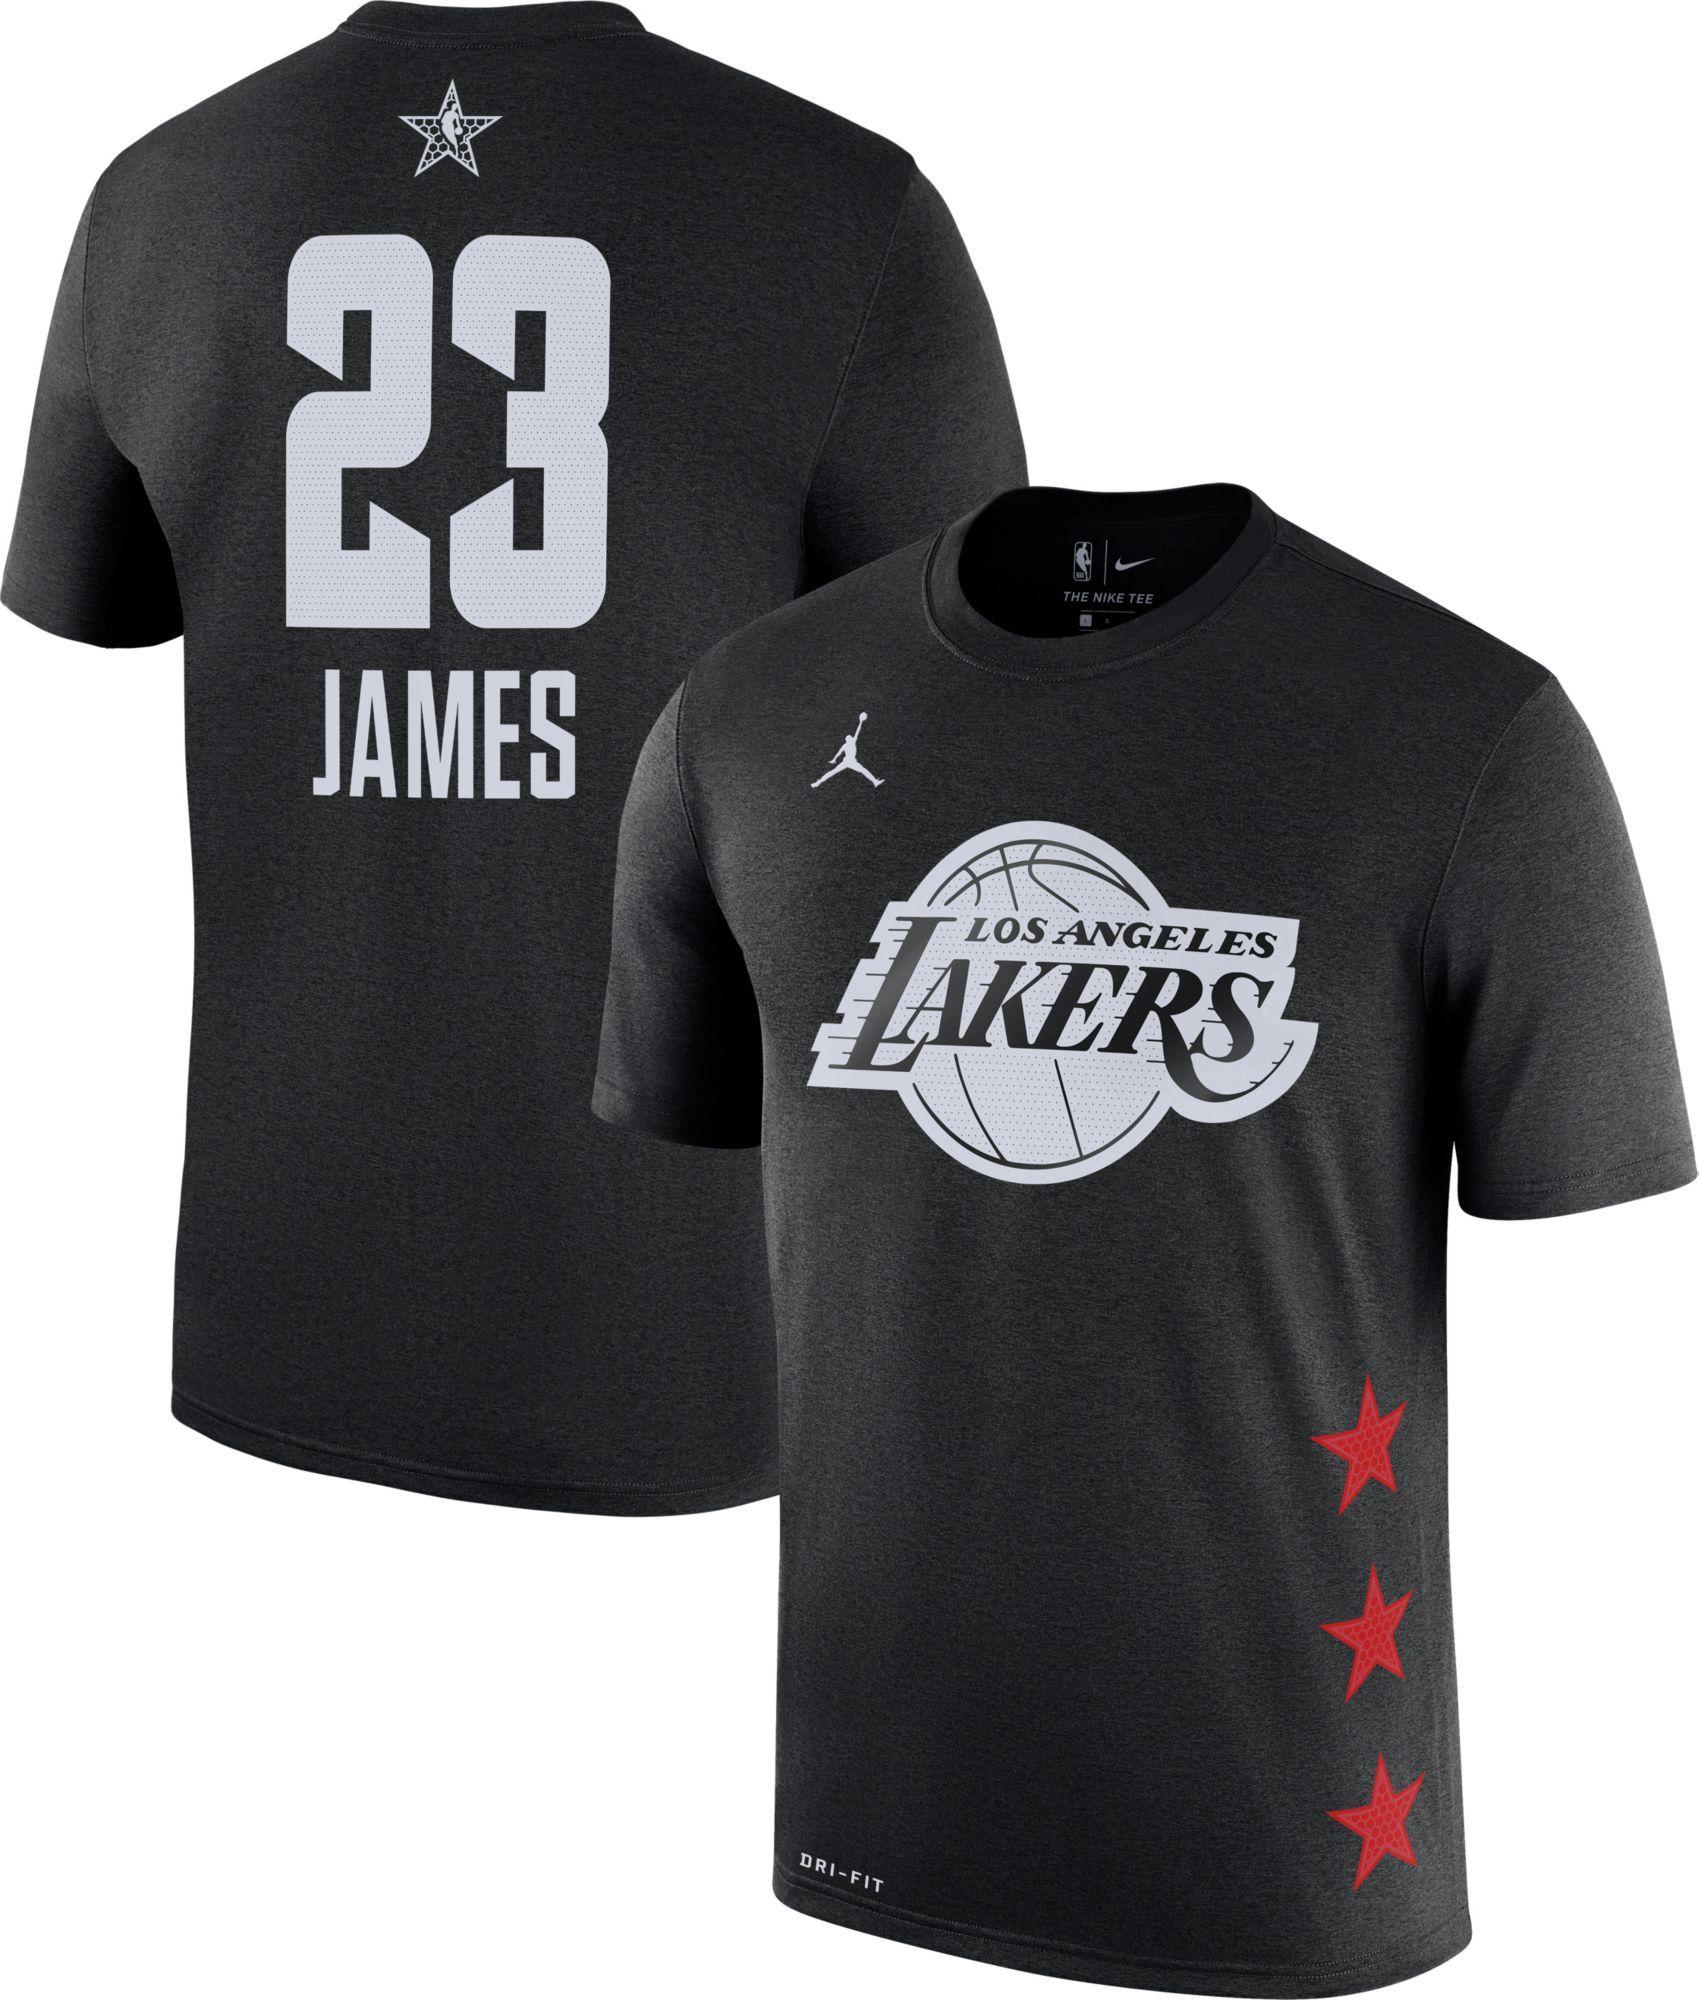 online store f94a3 8ea8e Jordan Youth 2019 NBA All-Star Game LeBron James Dri-FIT ...